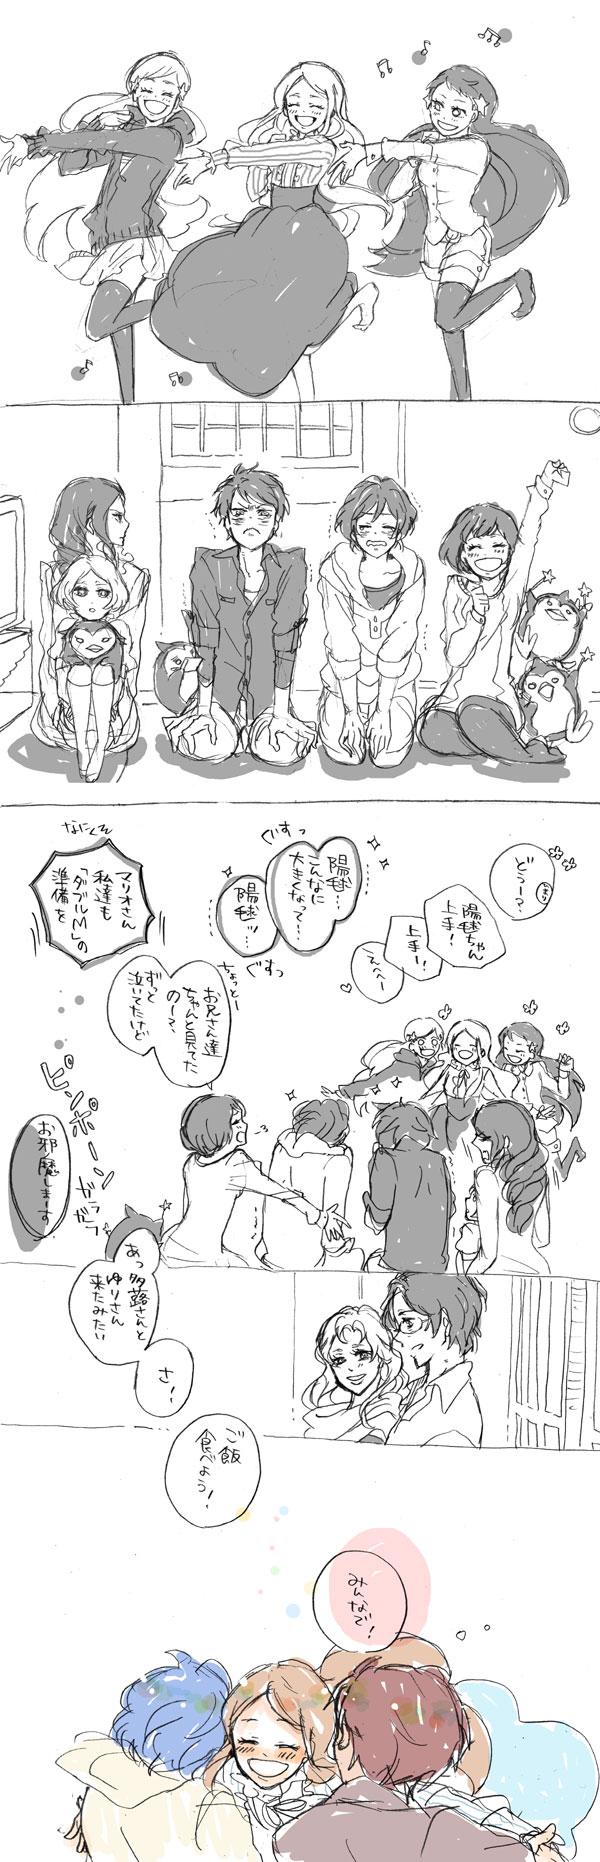 comic esmeralda_(mawaru_penguindrum) highres isora_hibari mawaru_penguindrum natsume_mario natsume_masako oginome_ringo pantyhose penguin penguin_1-gou penguin_2-gou penguin_3-gou siblings tabuki_keiju takakura_himari takakura_kanba takakura_shouma takana_pirafu thighhighs tokikago_yuri translated utada_hikari